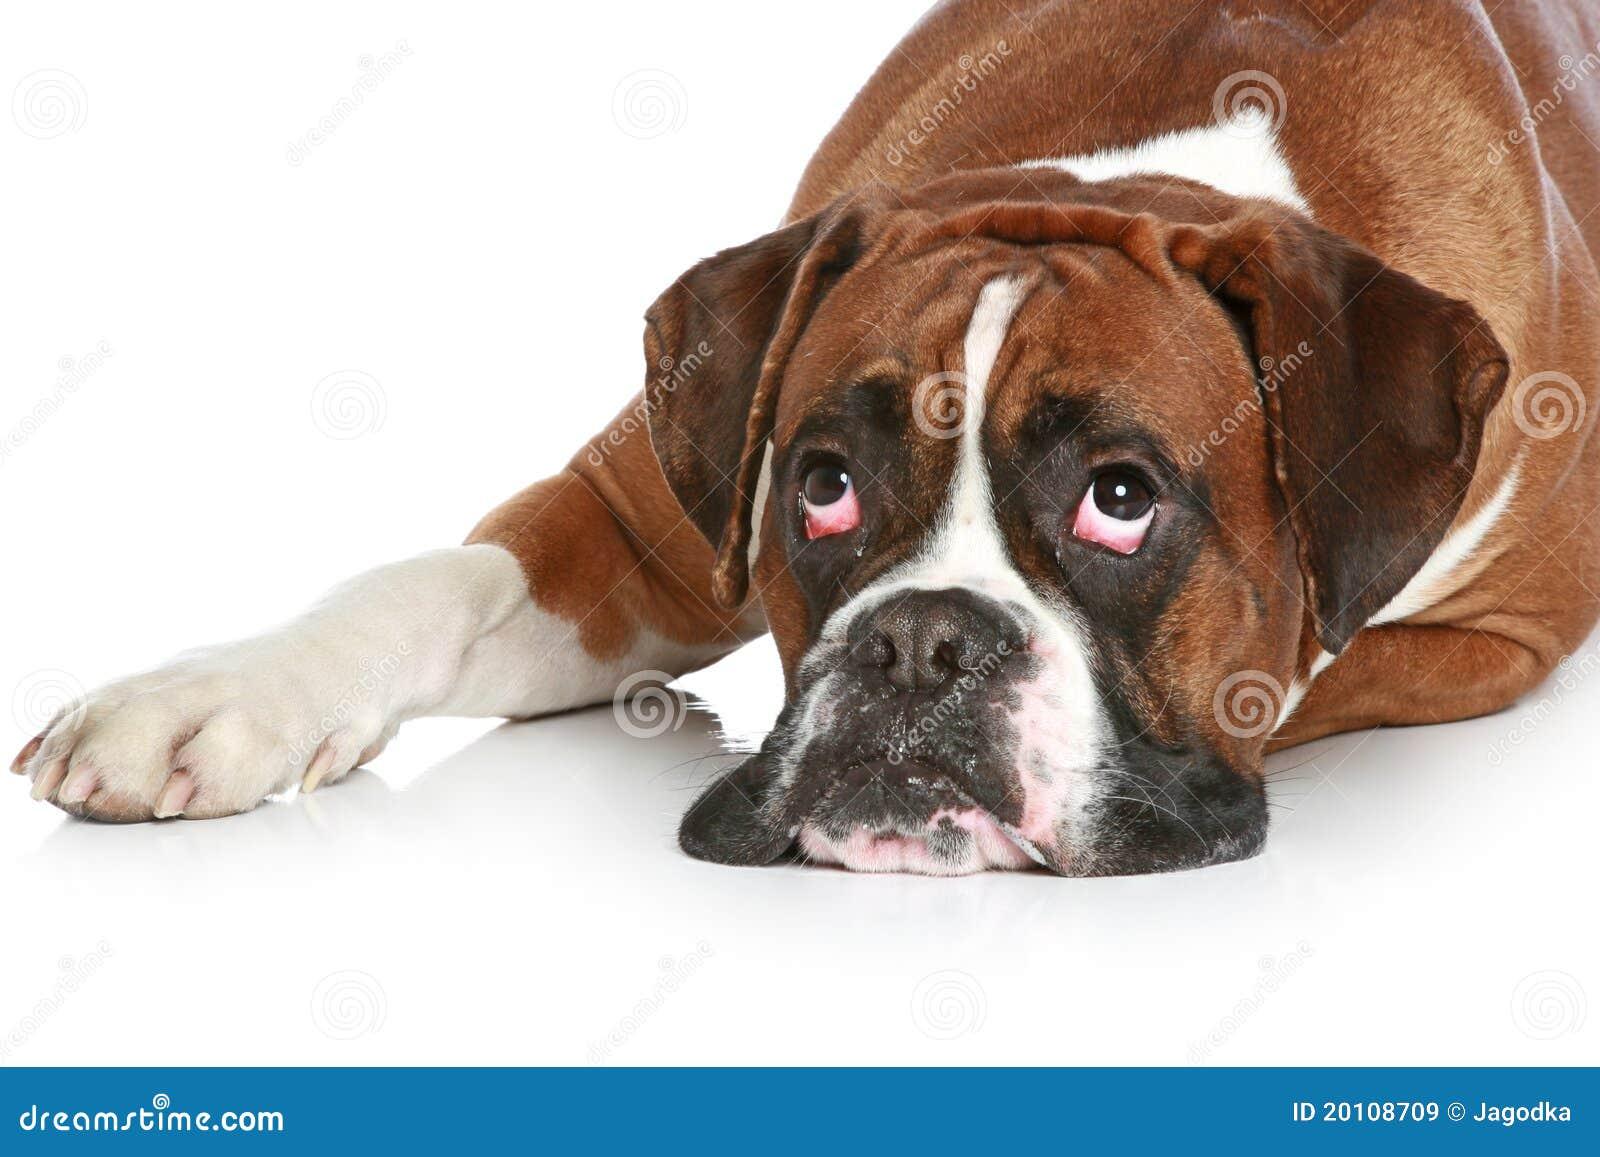 Sad Puppy Dog Lip